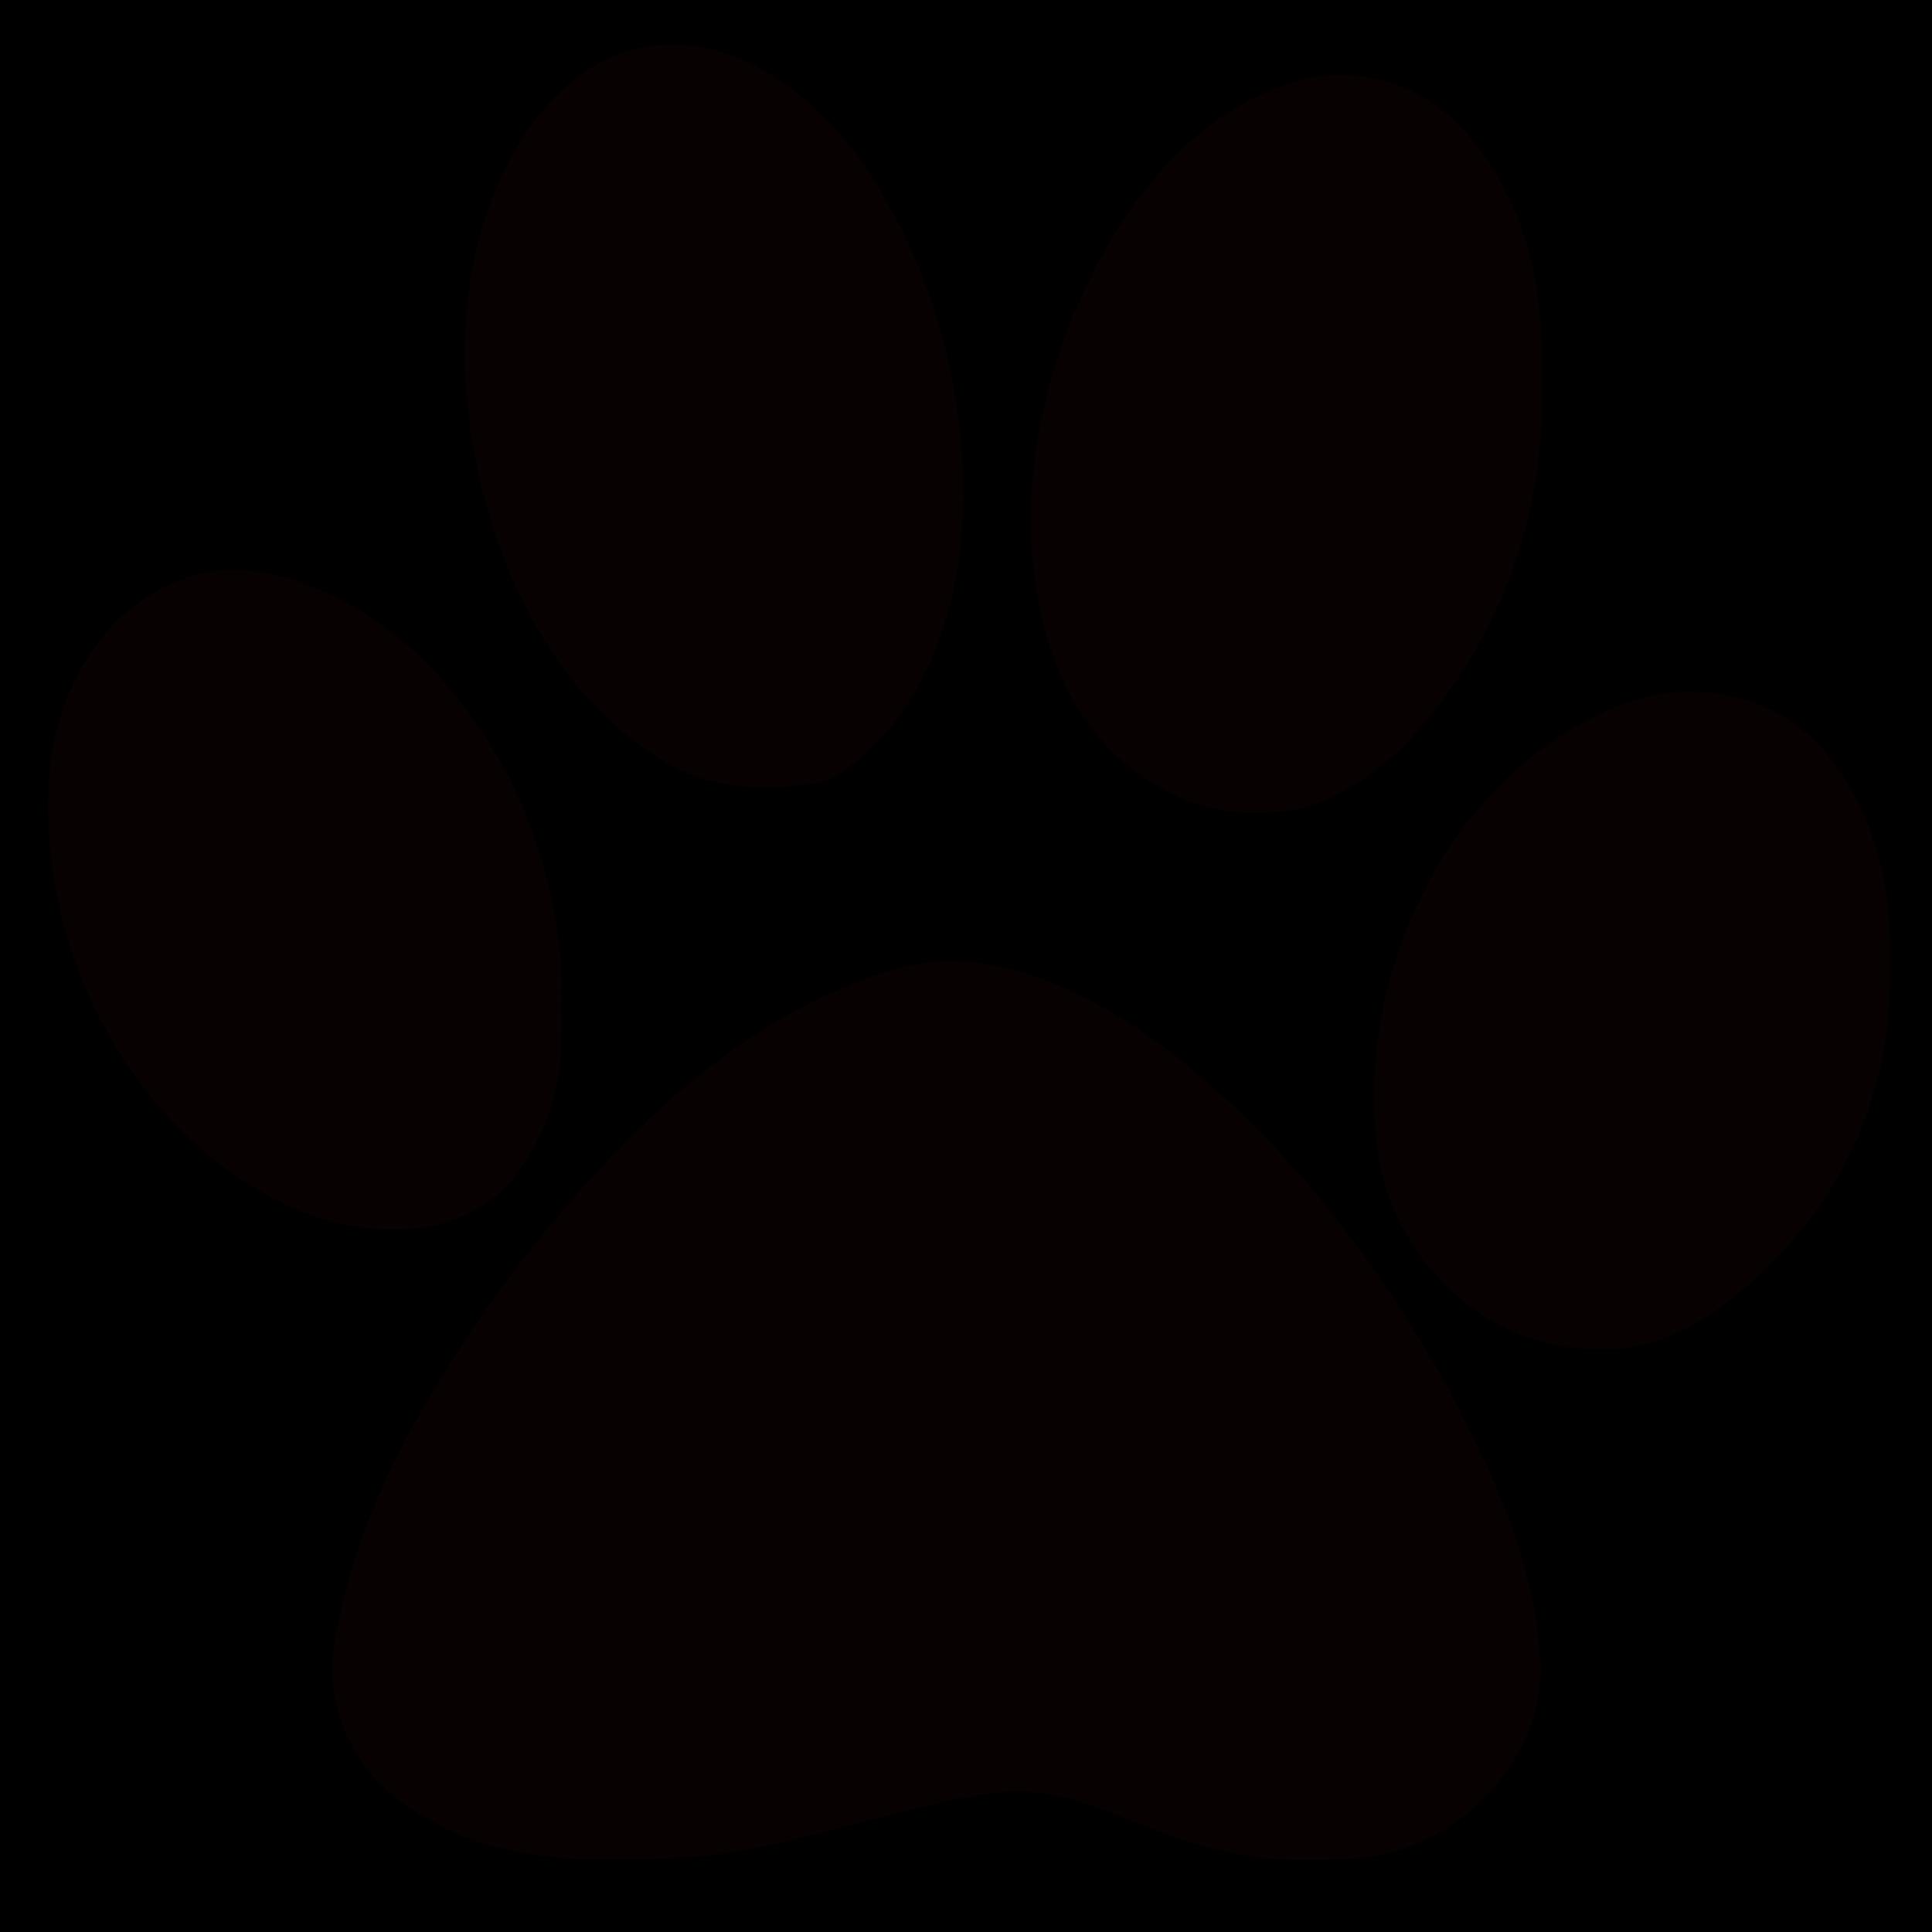 Panther Paw Print Clip Art.